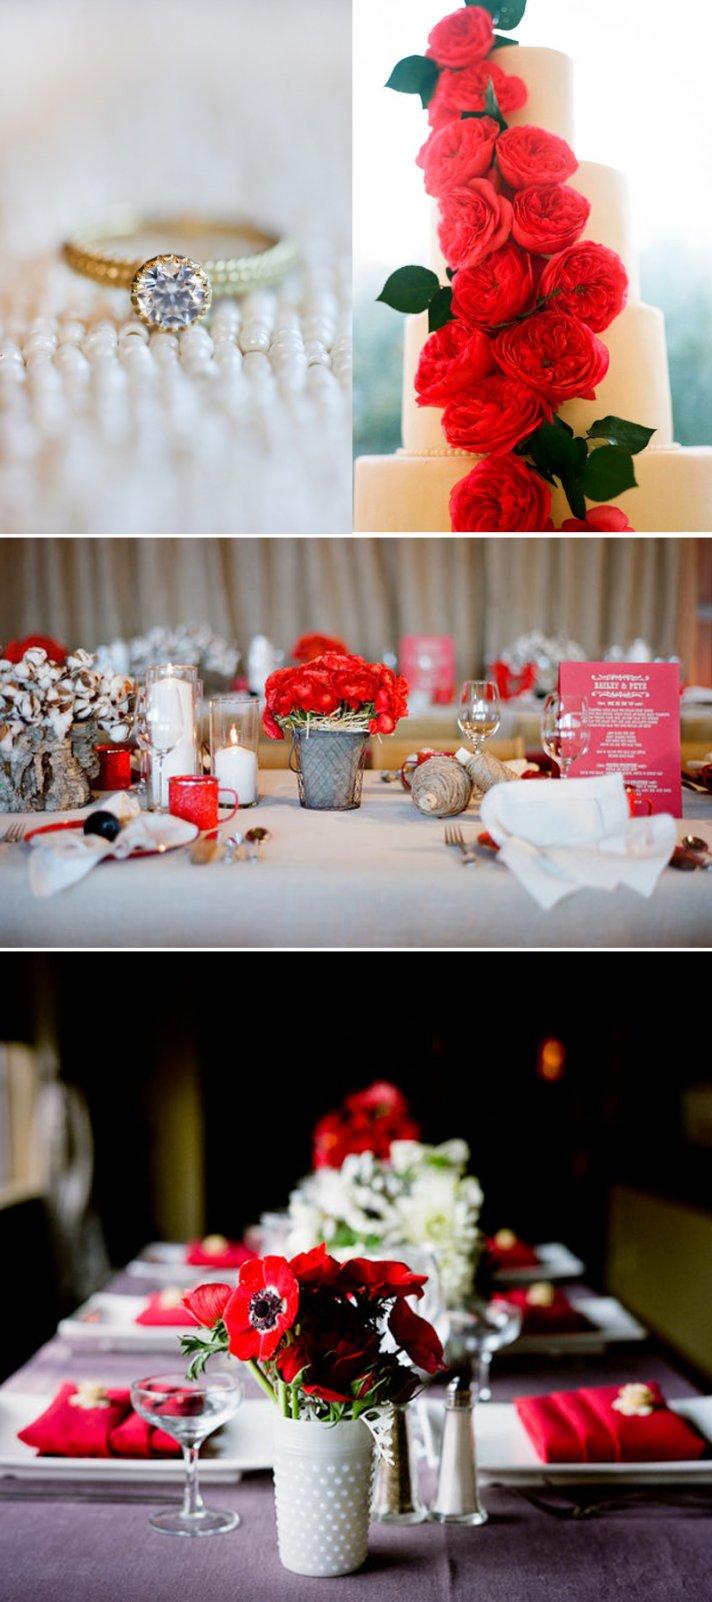 wedding color ideas red white black reception flowers decor